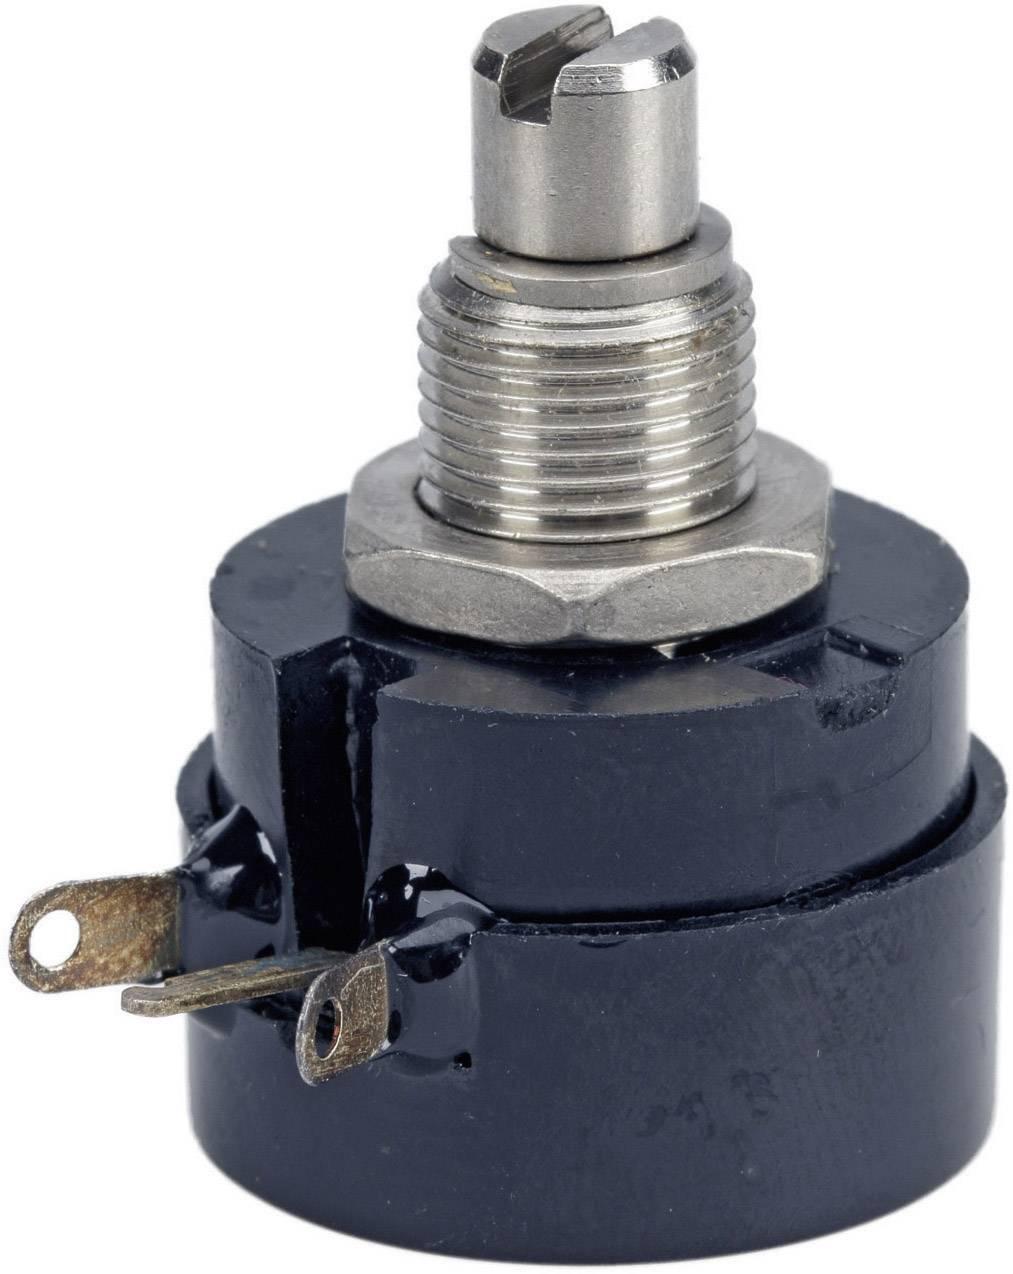 Drôtový potenciometer mono TT Electronics AB 3101106910 3101106910, 0.5 W, 100 Ohm, 1 ks